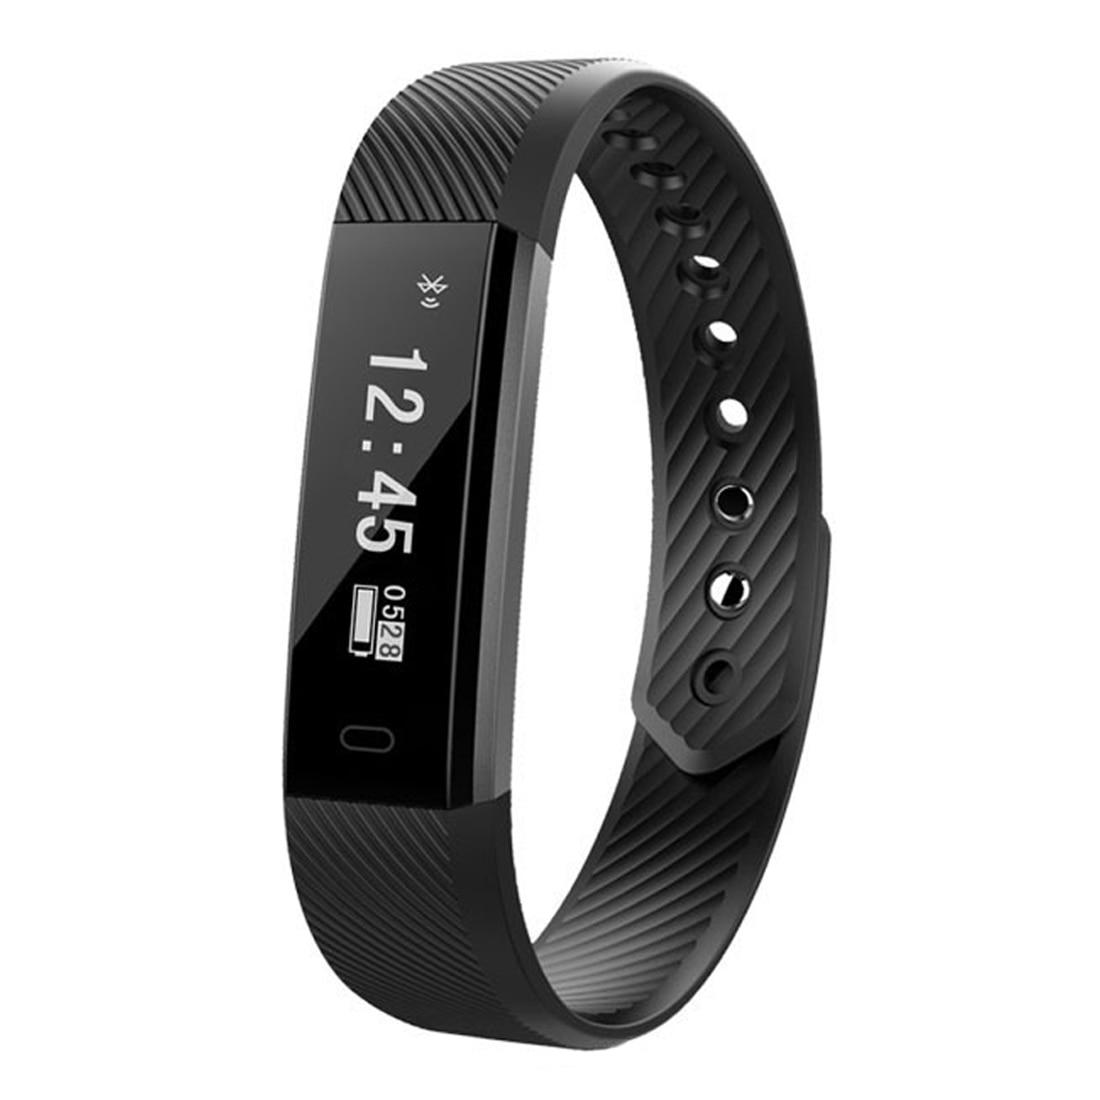 Hot Fitness Uhr Tracker Laufen Schritt Kalorien Zähler Smart Armband Aktivität Monitor Band Wecker Vibration Armband Fitnessgeräte